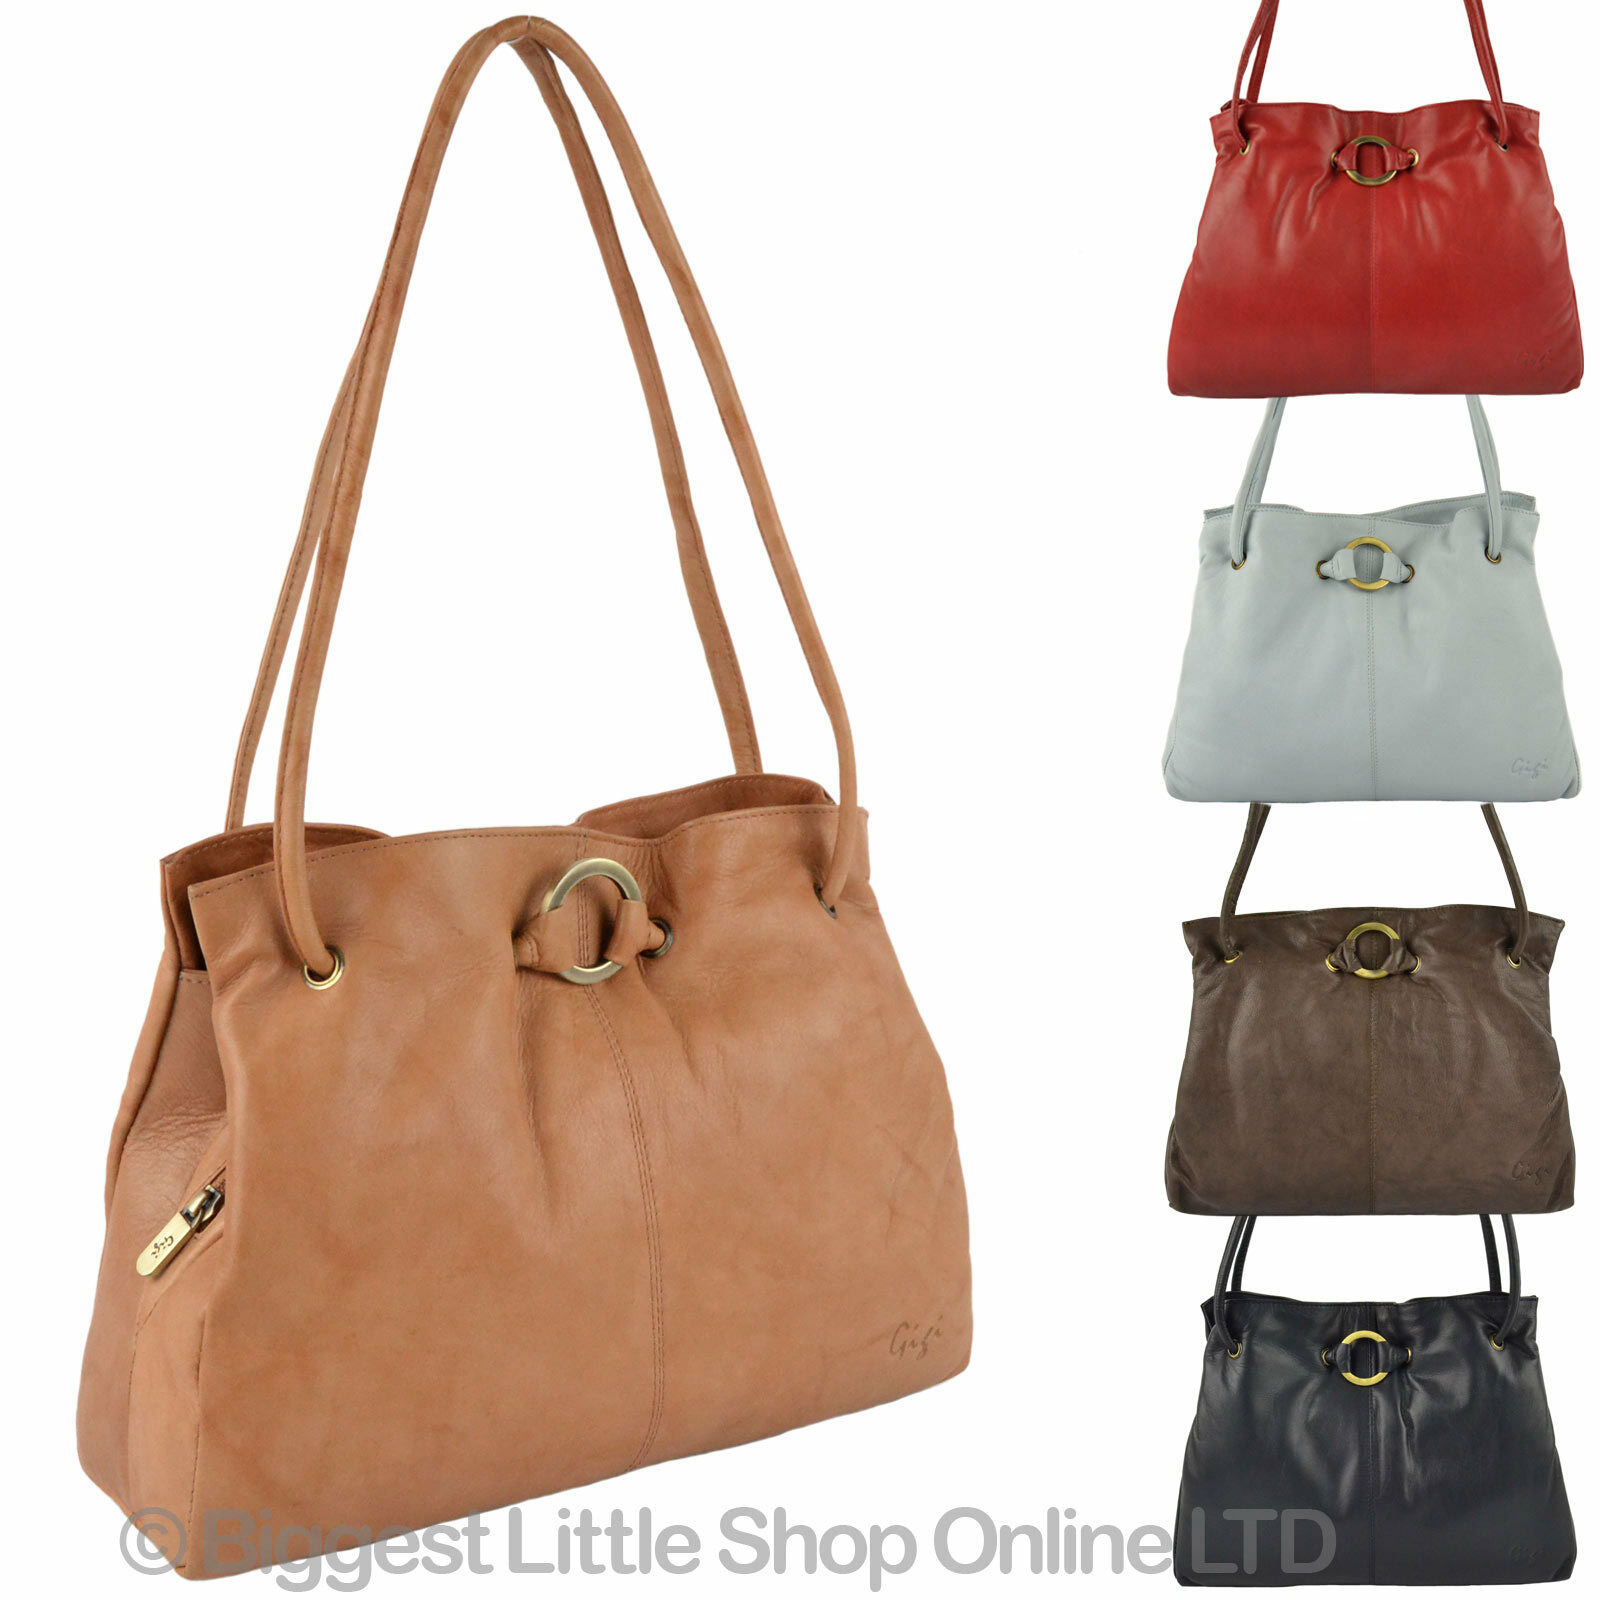 New Las Soft Leather Shoulder Handbag By Gigi Othello Collection Classic